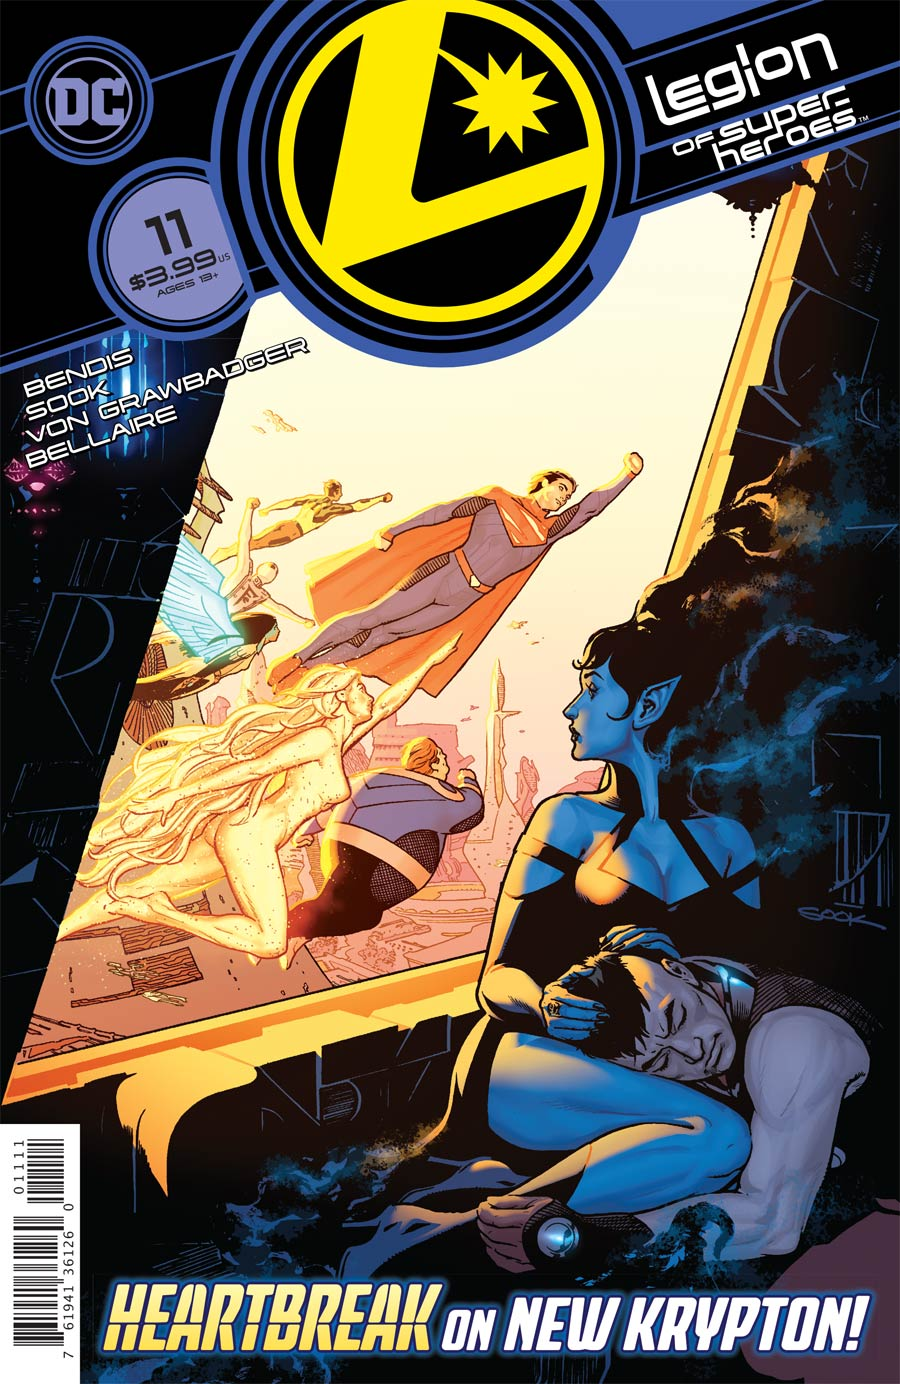 Legion Of Super-Heroes Vol 8 #11 Cover A Regular Ryan Sook Cover